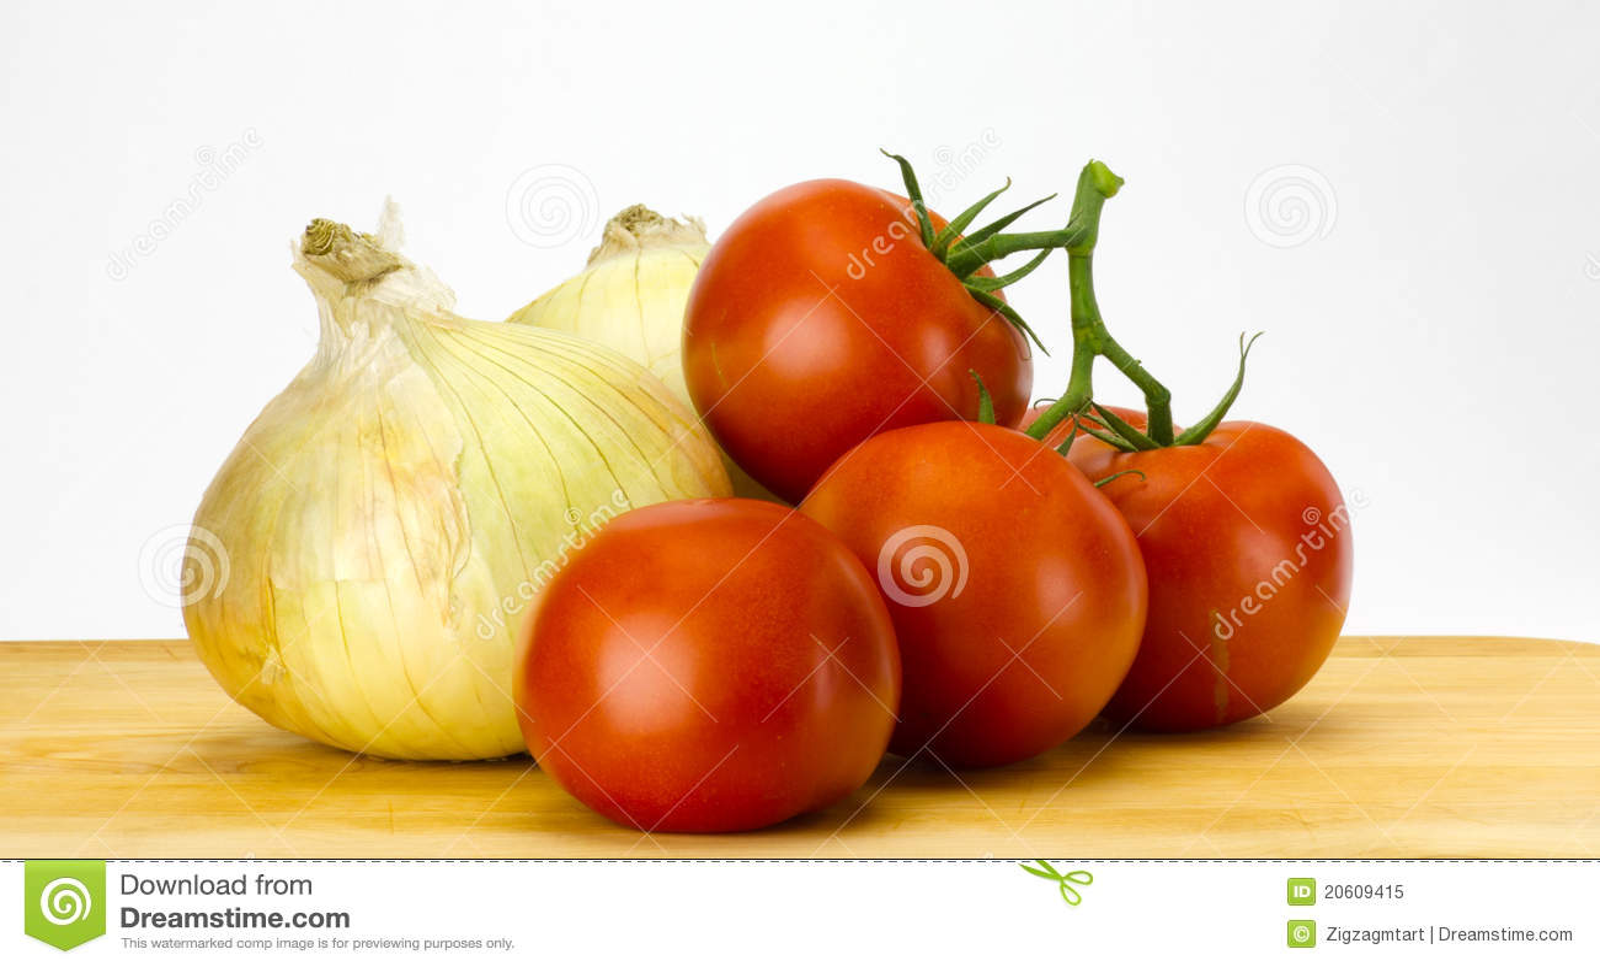 onion and tomato essay onion tomato chutney recipe, how to make tomato onion chutney recipe